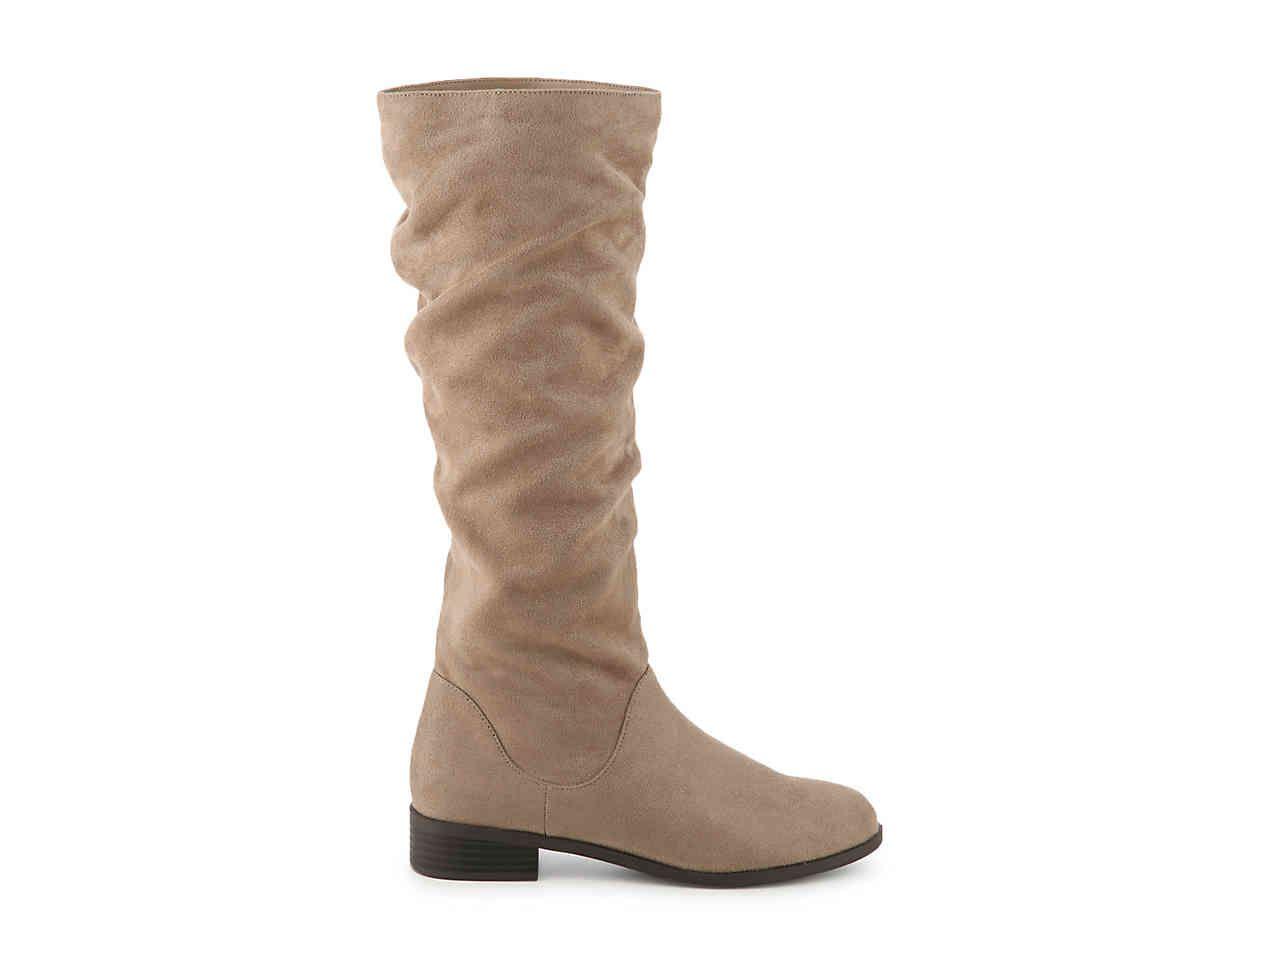 Kelly \u0026 Katie Lilyana Wide Calf Boot